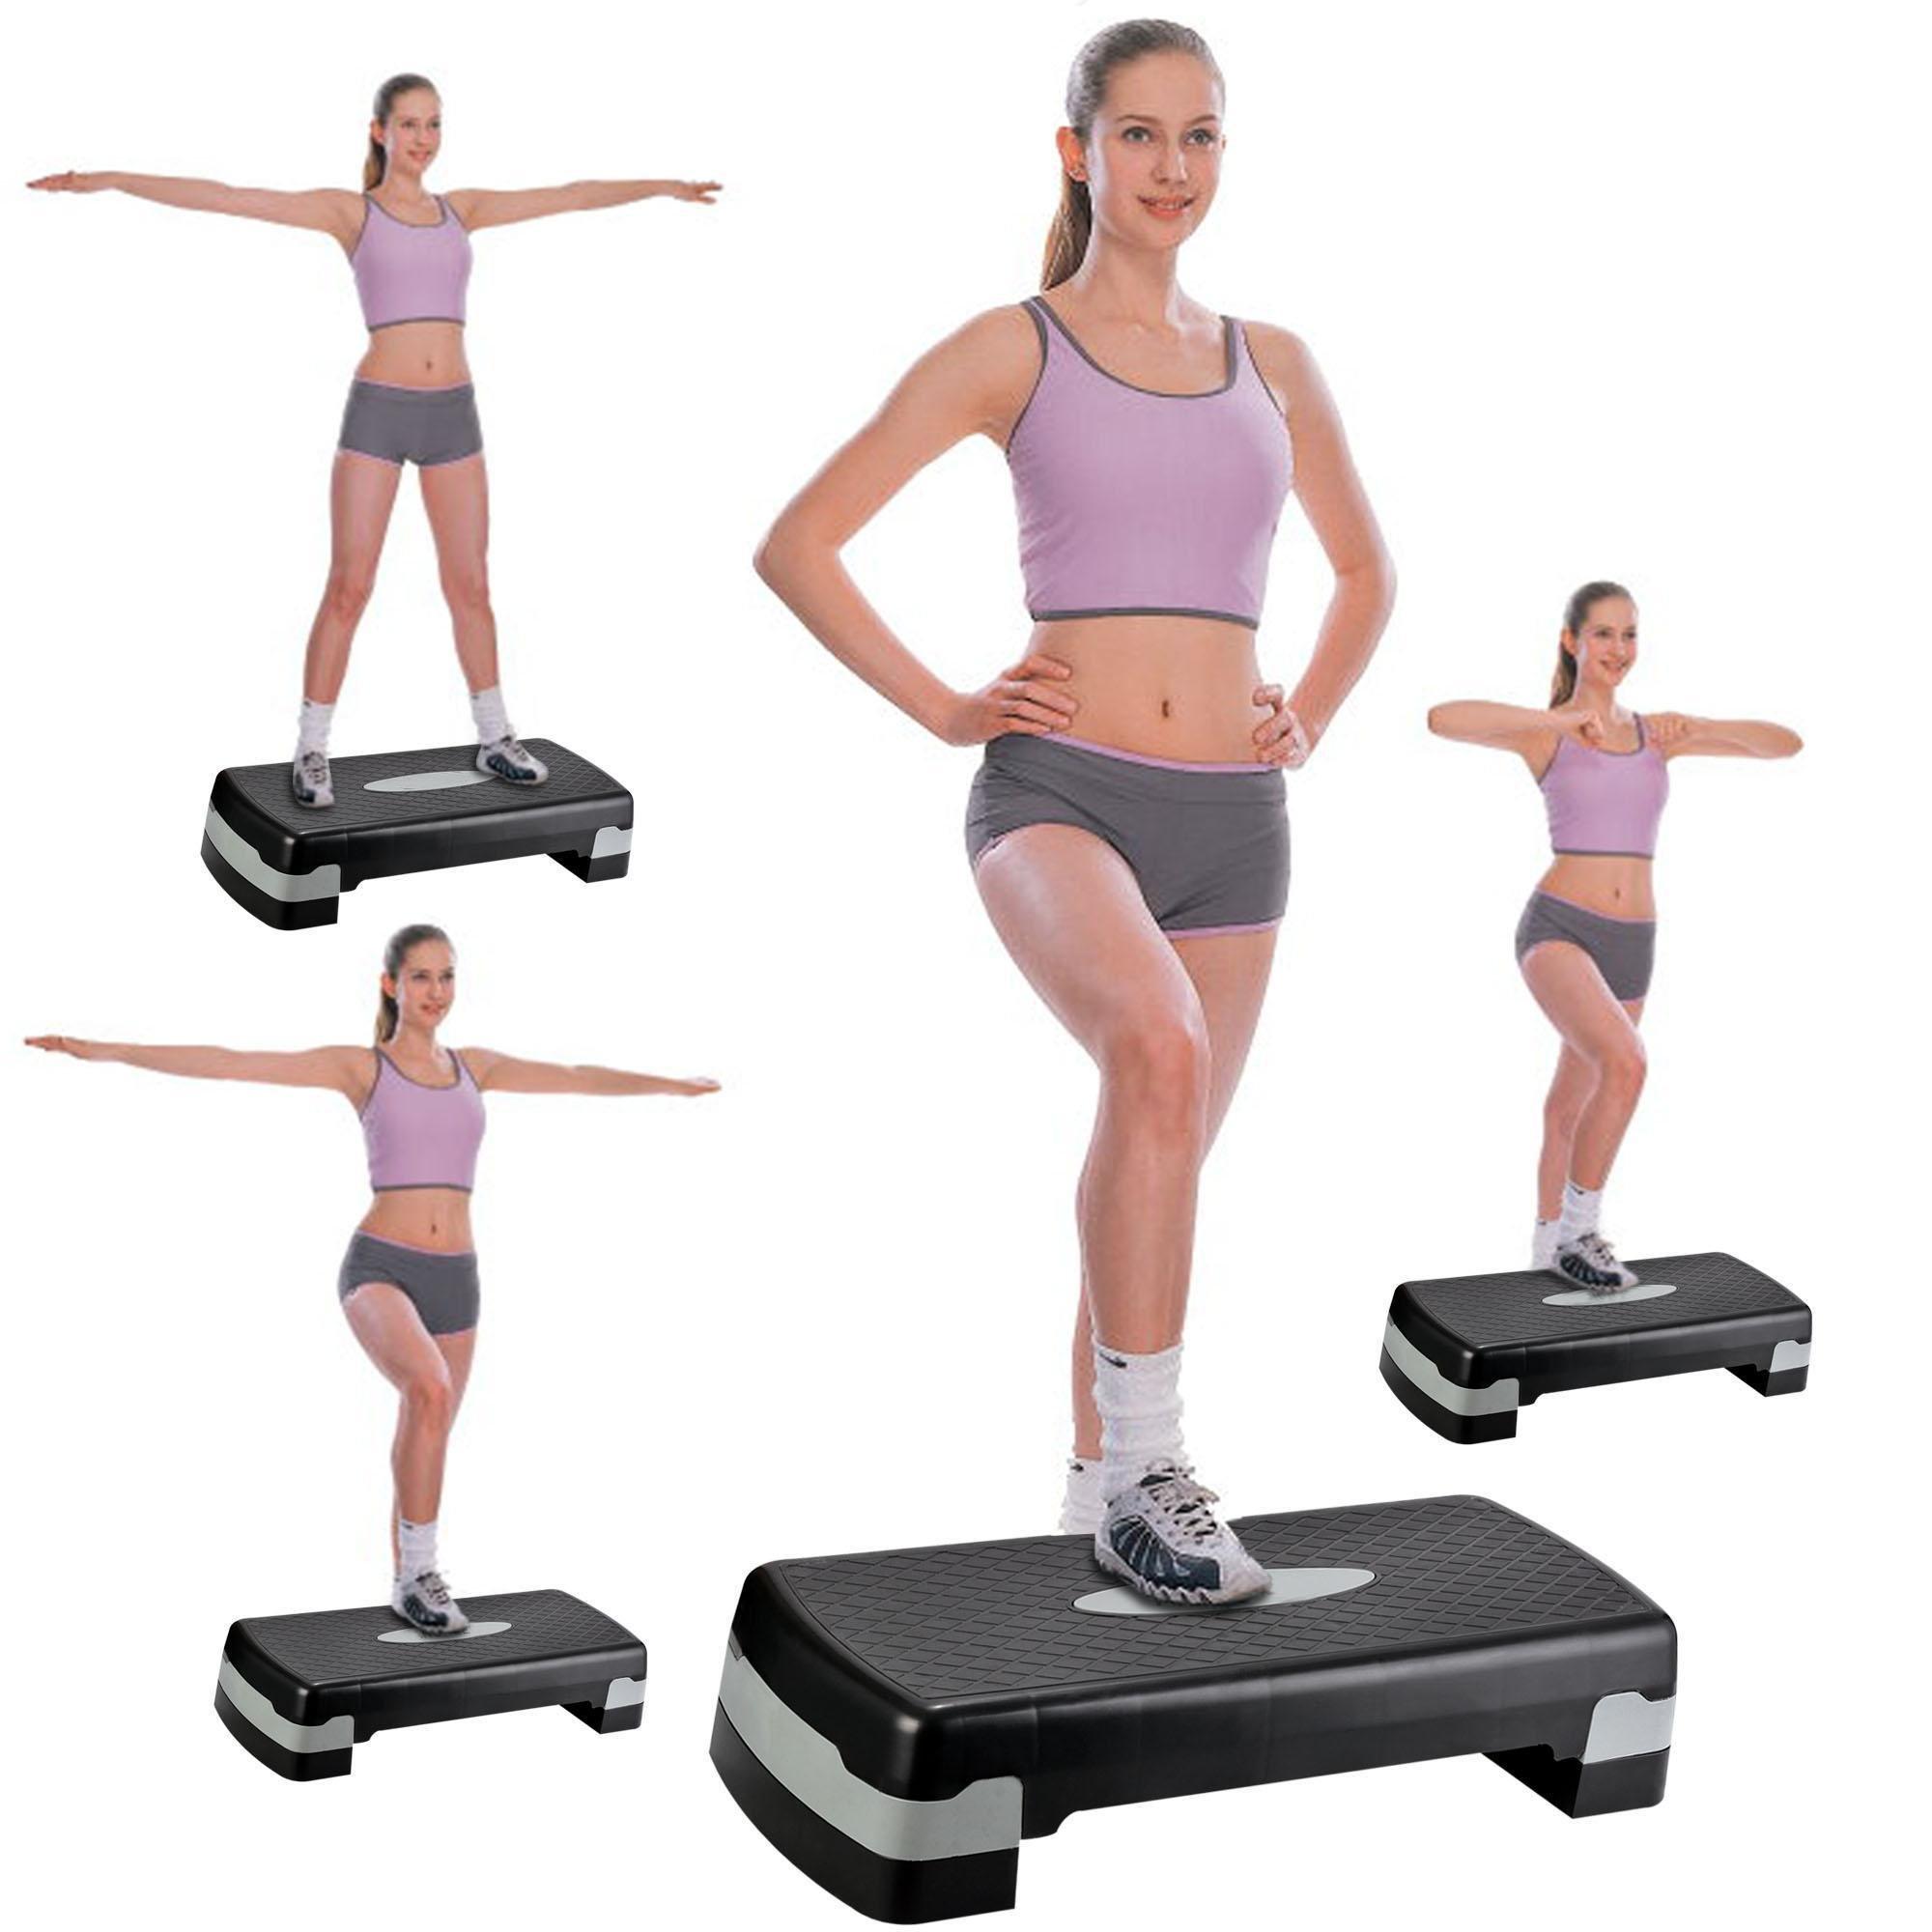 PEATAO Exerciser Stepper, Fitness Aerobic Step Platforms Adjustable Height Stepper Home Exerciser Training Stepper Board Stock in US